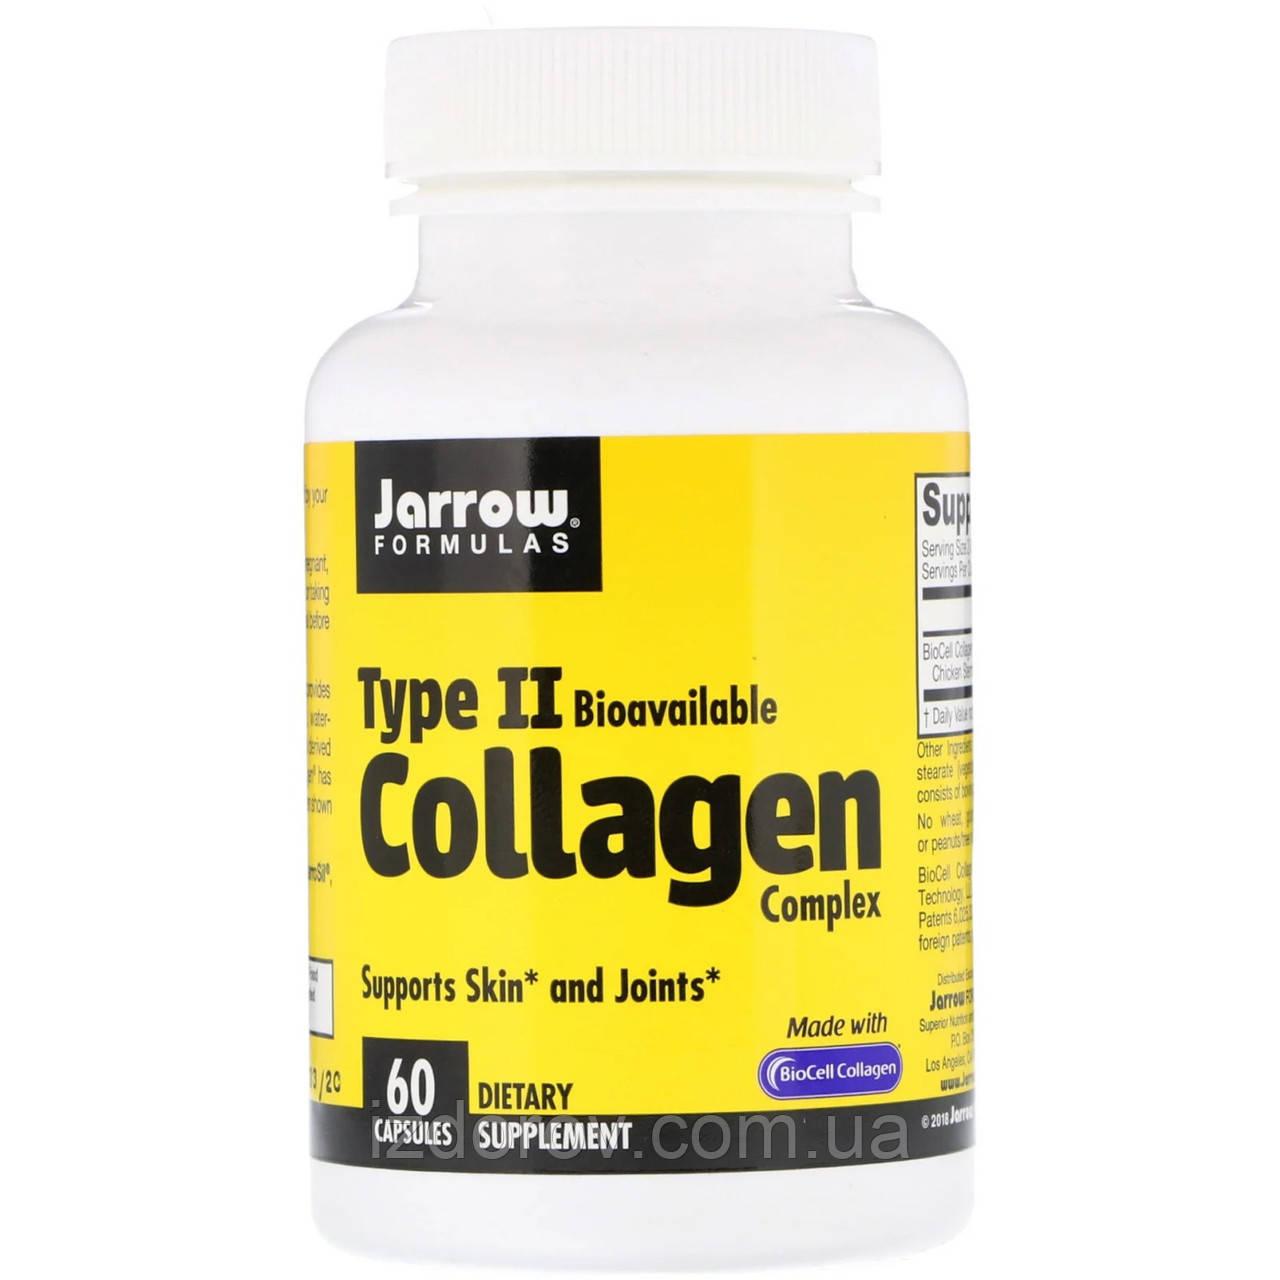 Jarrow Formulas, Комплекс колагенів 2 типу, Type II Collagen Complex, для здоров'я суглобів, 60 капсул